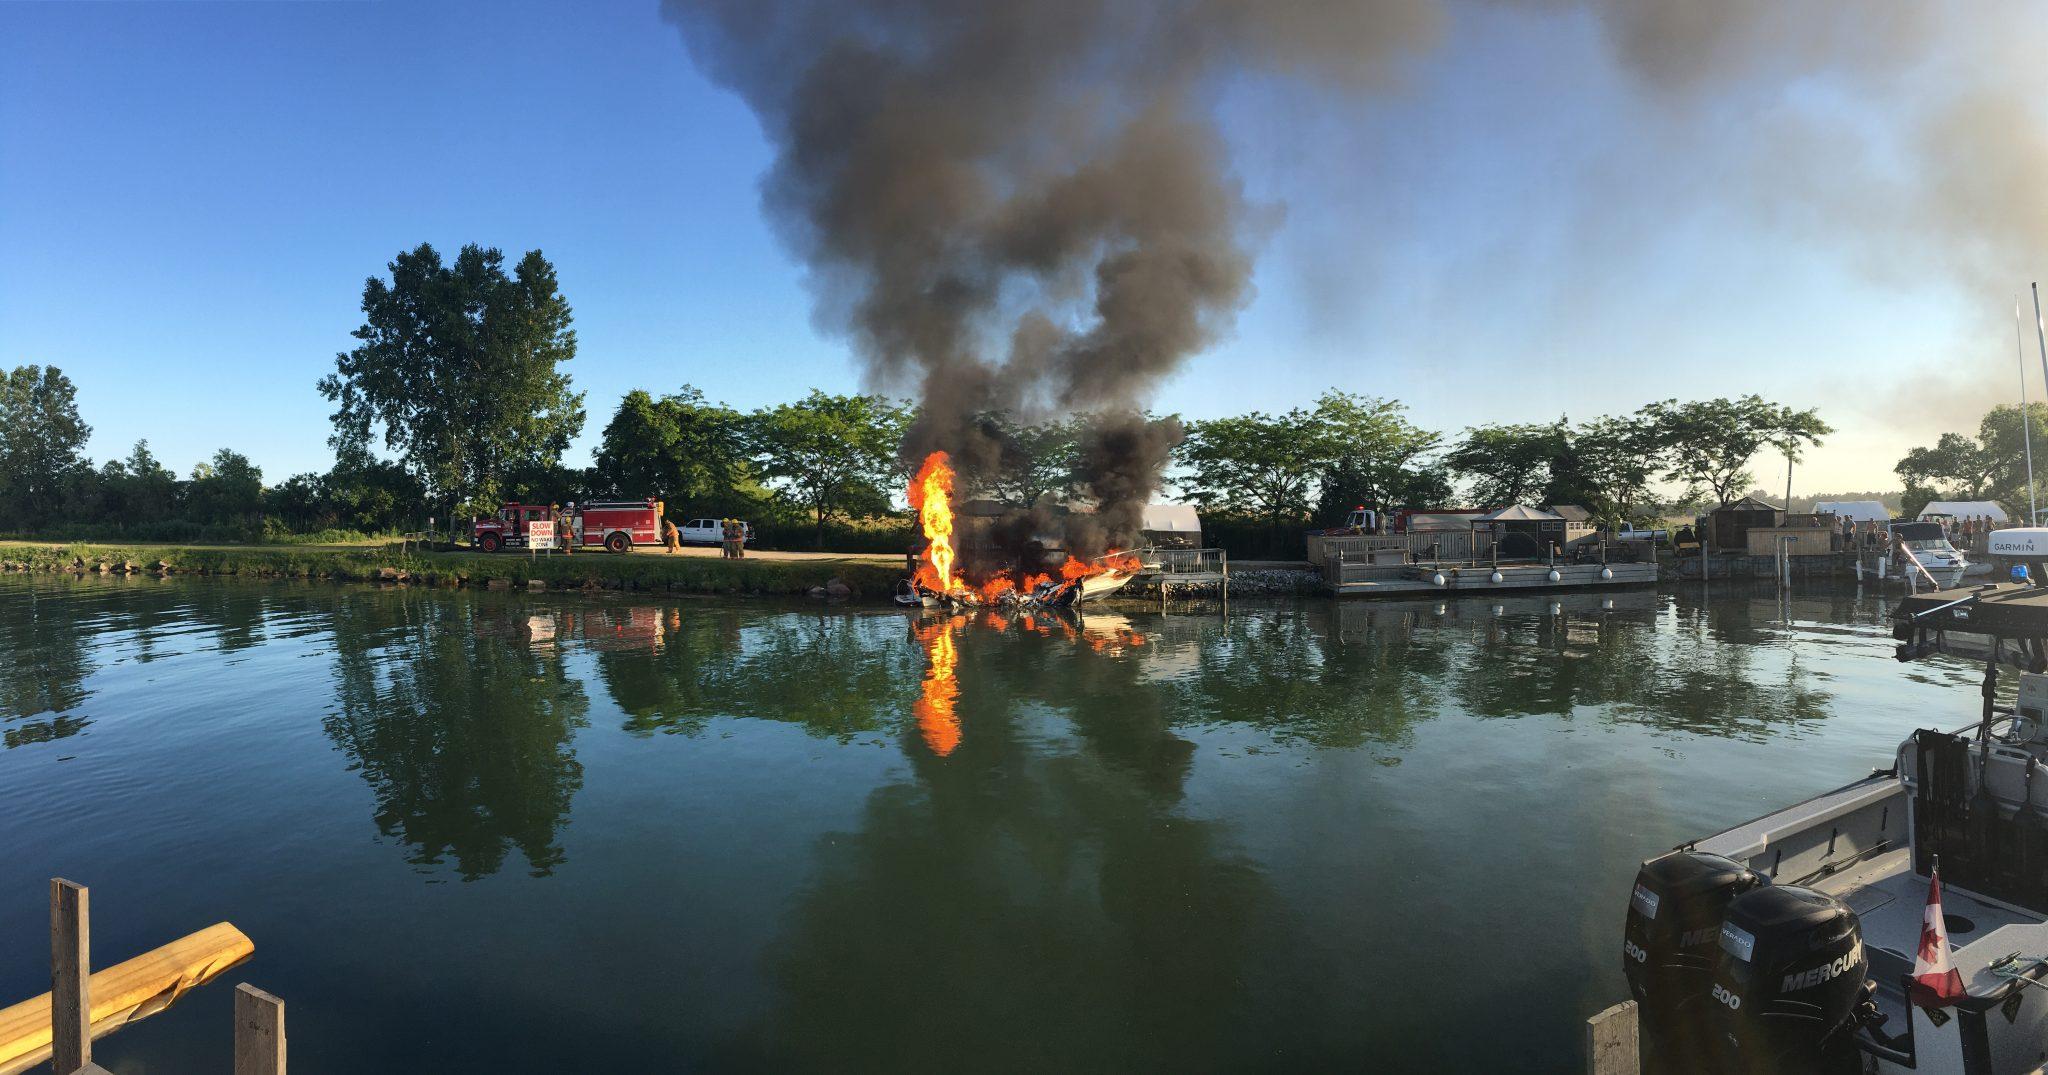 danny macdonald's photo of fire